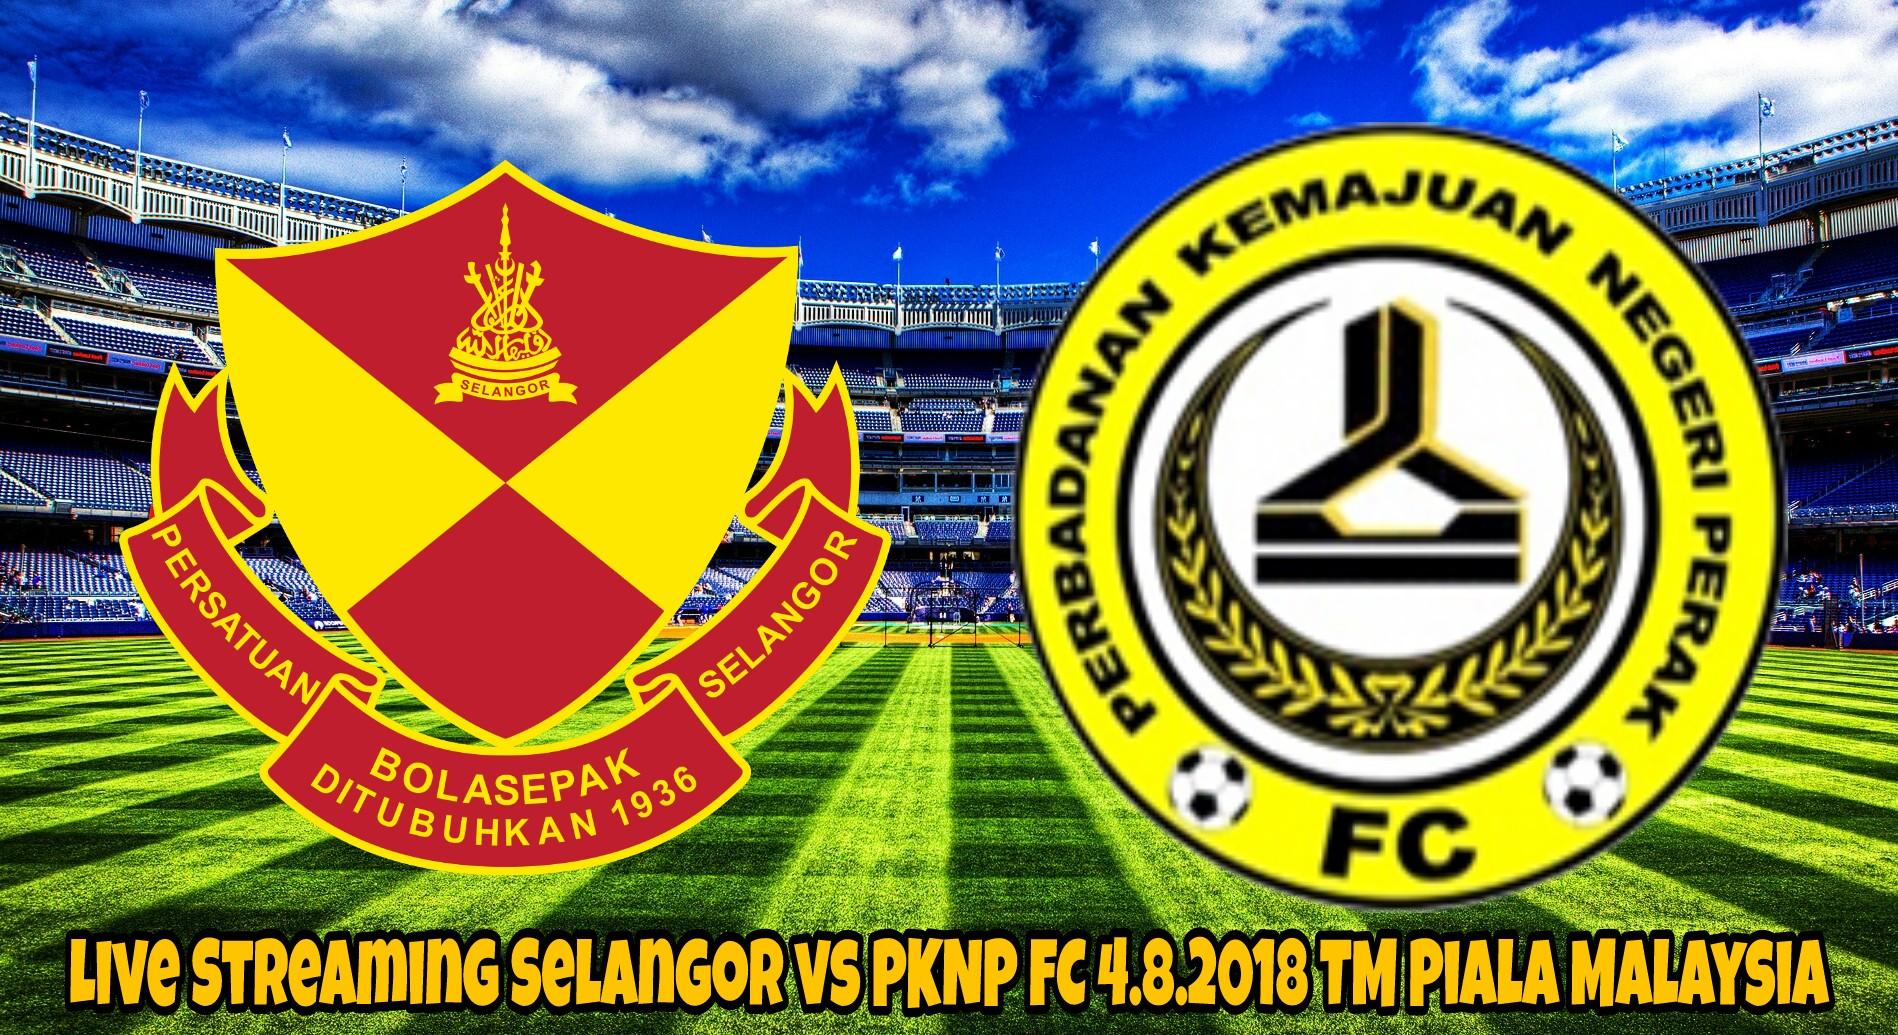 Live Streaming Selangor vs PKNP FC 4.8.2018 TM Piala Malaysia